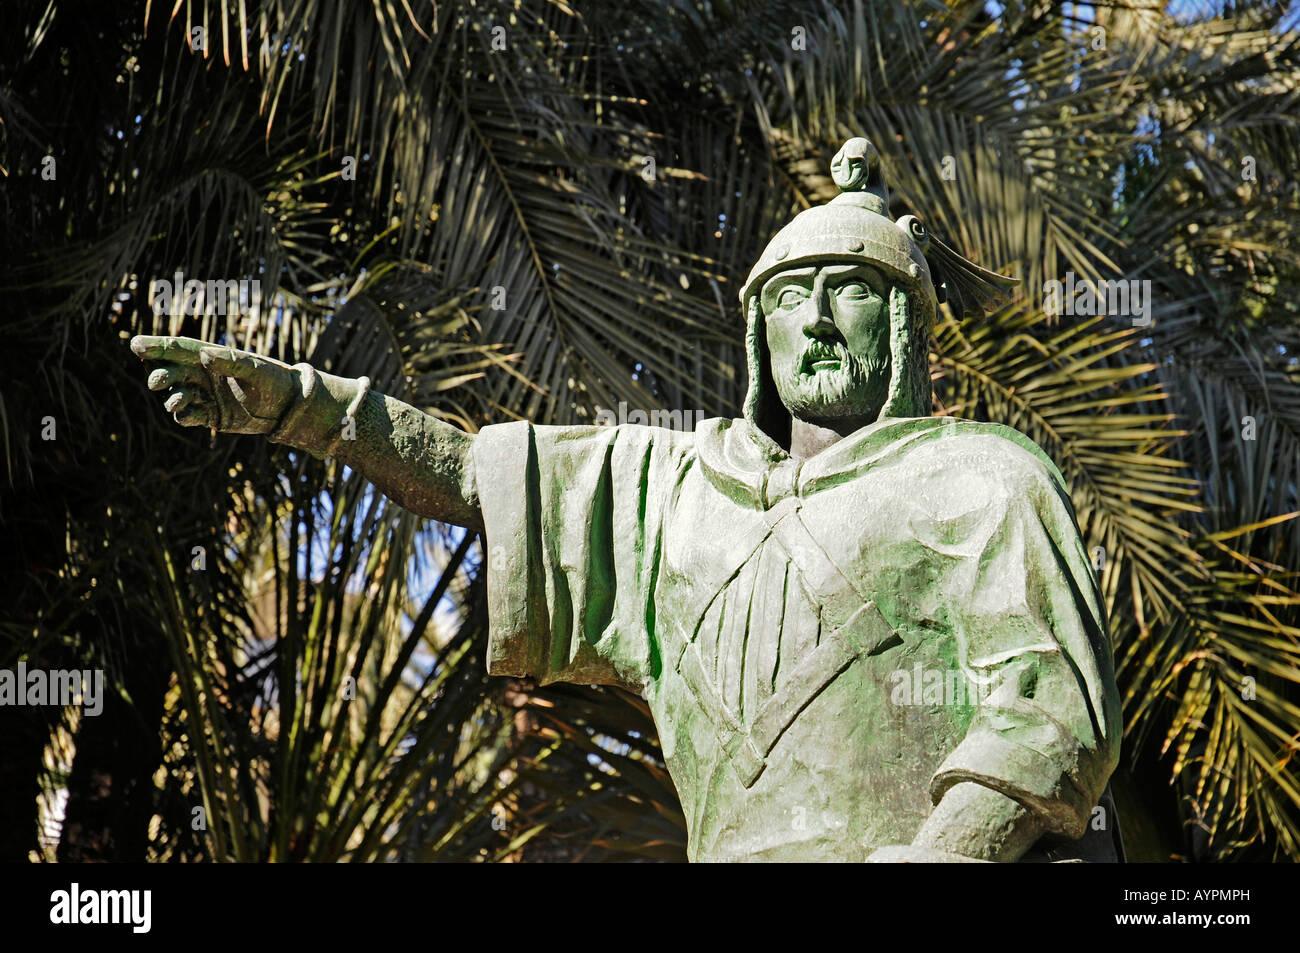 Sculpture of Jaime the Conqueror, Huerto del Cura Gardens, Palmeral of Elche, Elx, Alicante, Costa Blanca, Spain - Stock Image